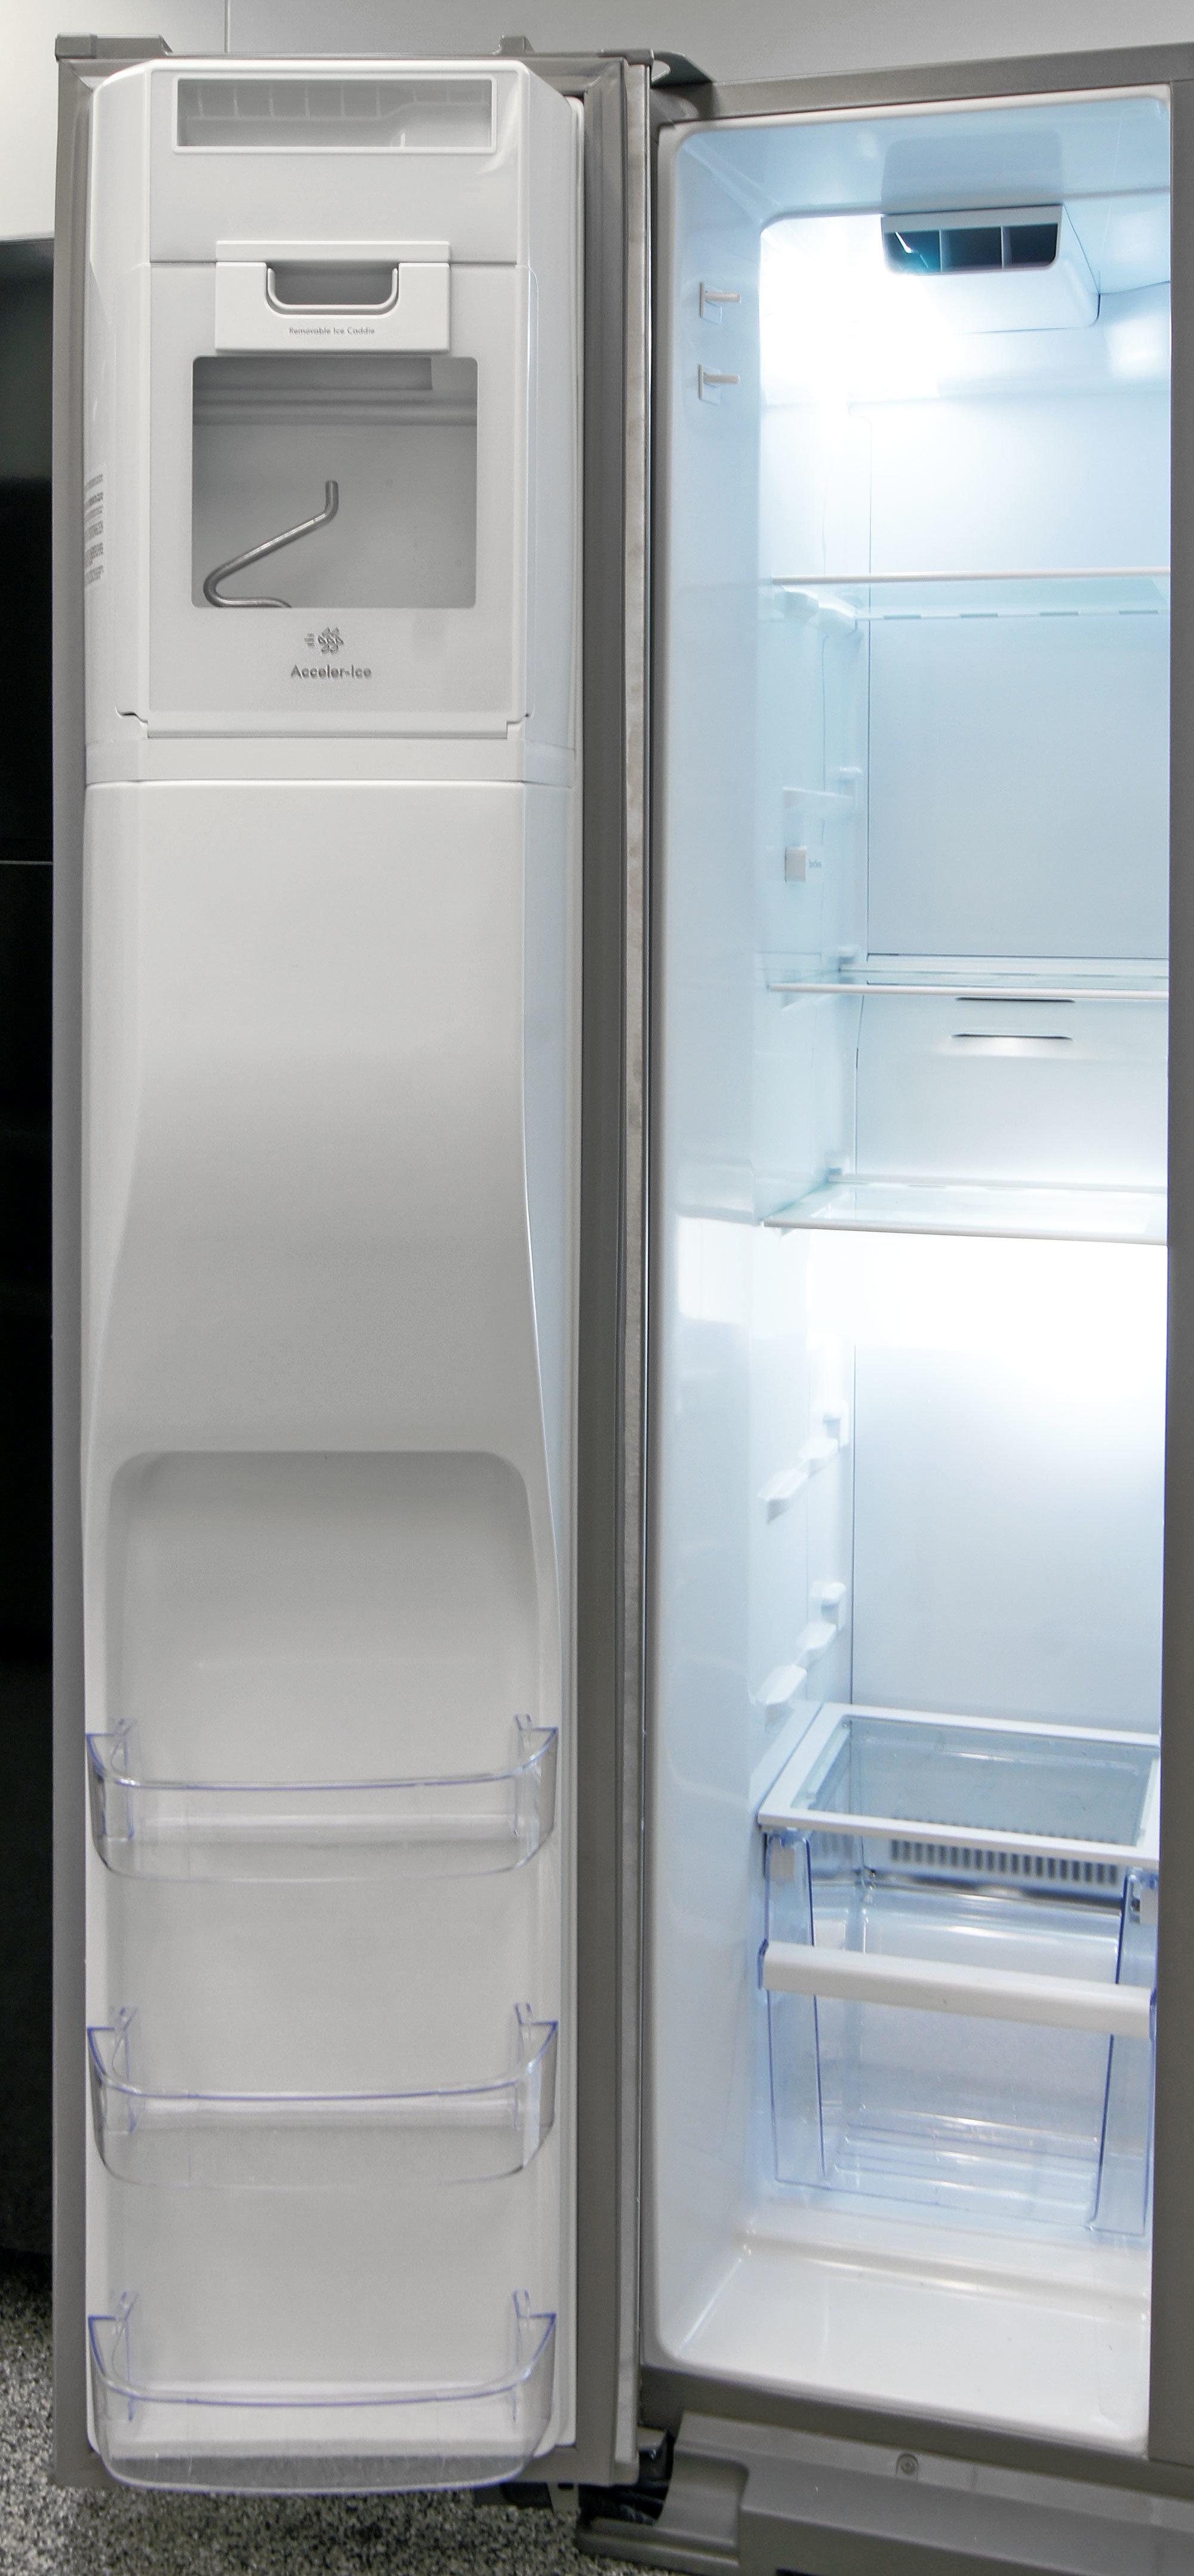 kenmore 51783 refrigerator review refrigerators. Black Bedroom Furniture Sets. Home Design Ideas